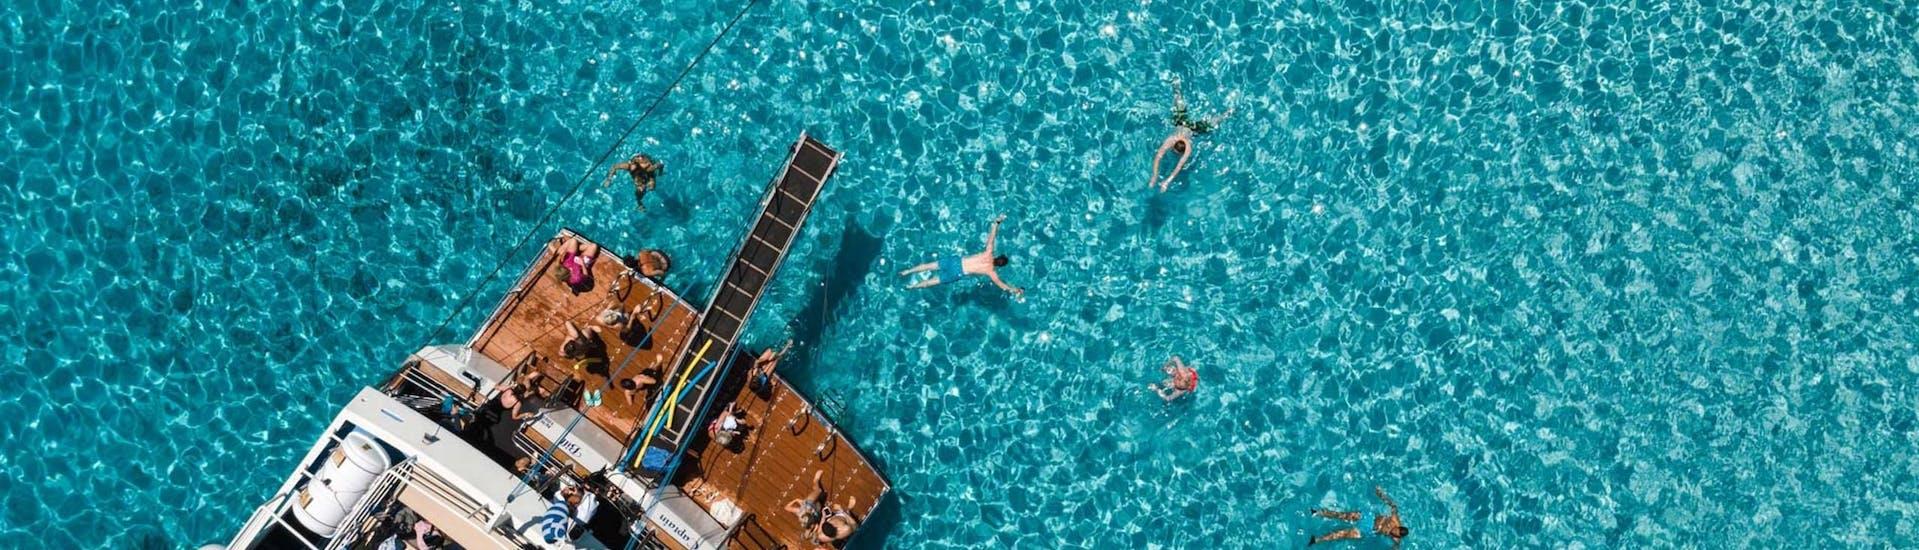 boat-tour-from-corfu-to-paxos-antipaxos-blue-caves-corfu-cruises-hero